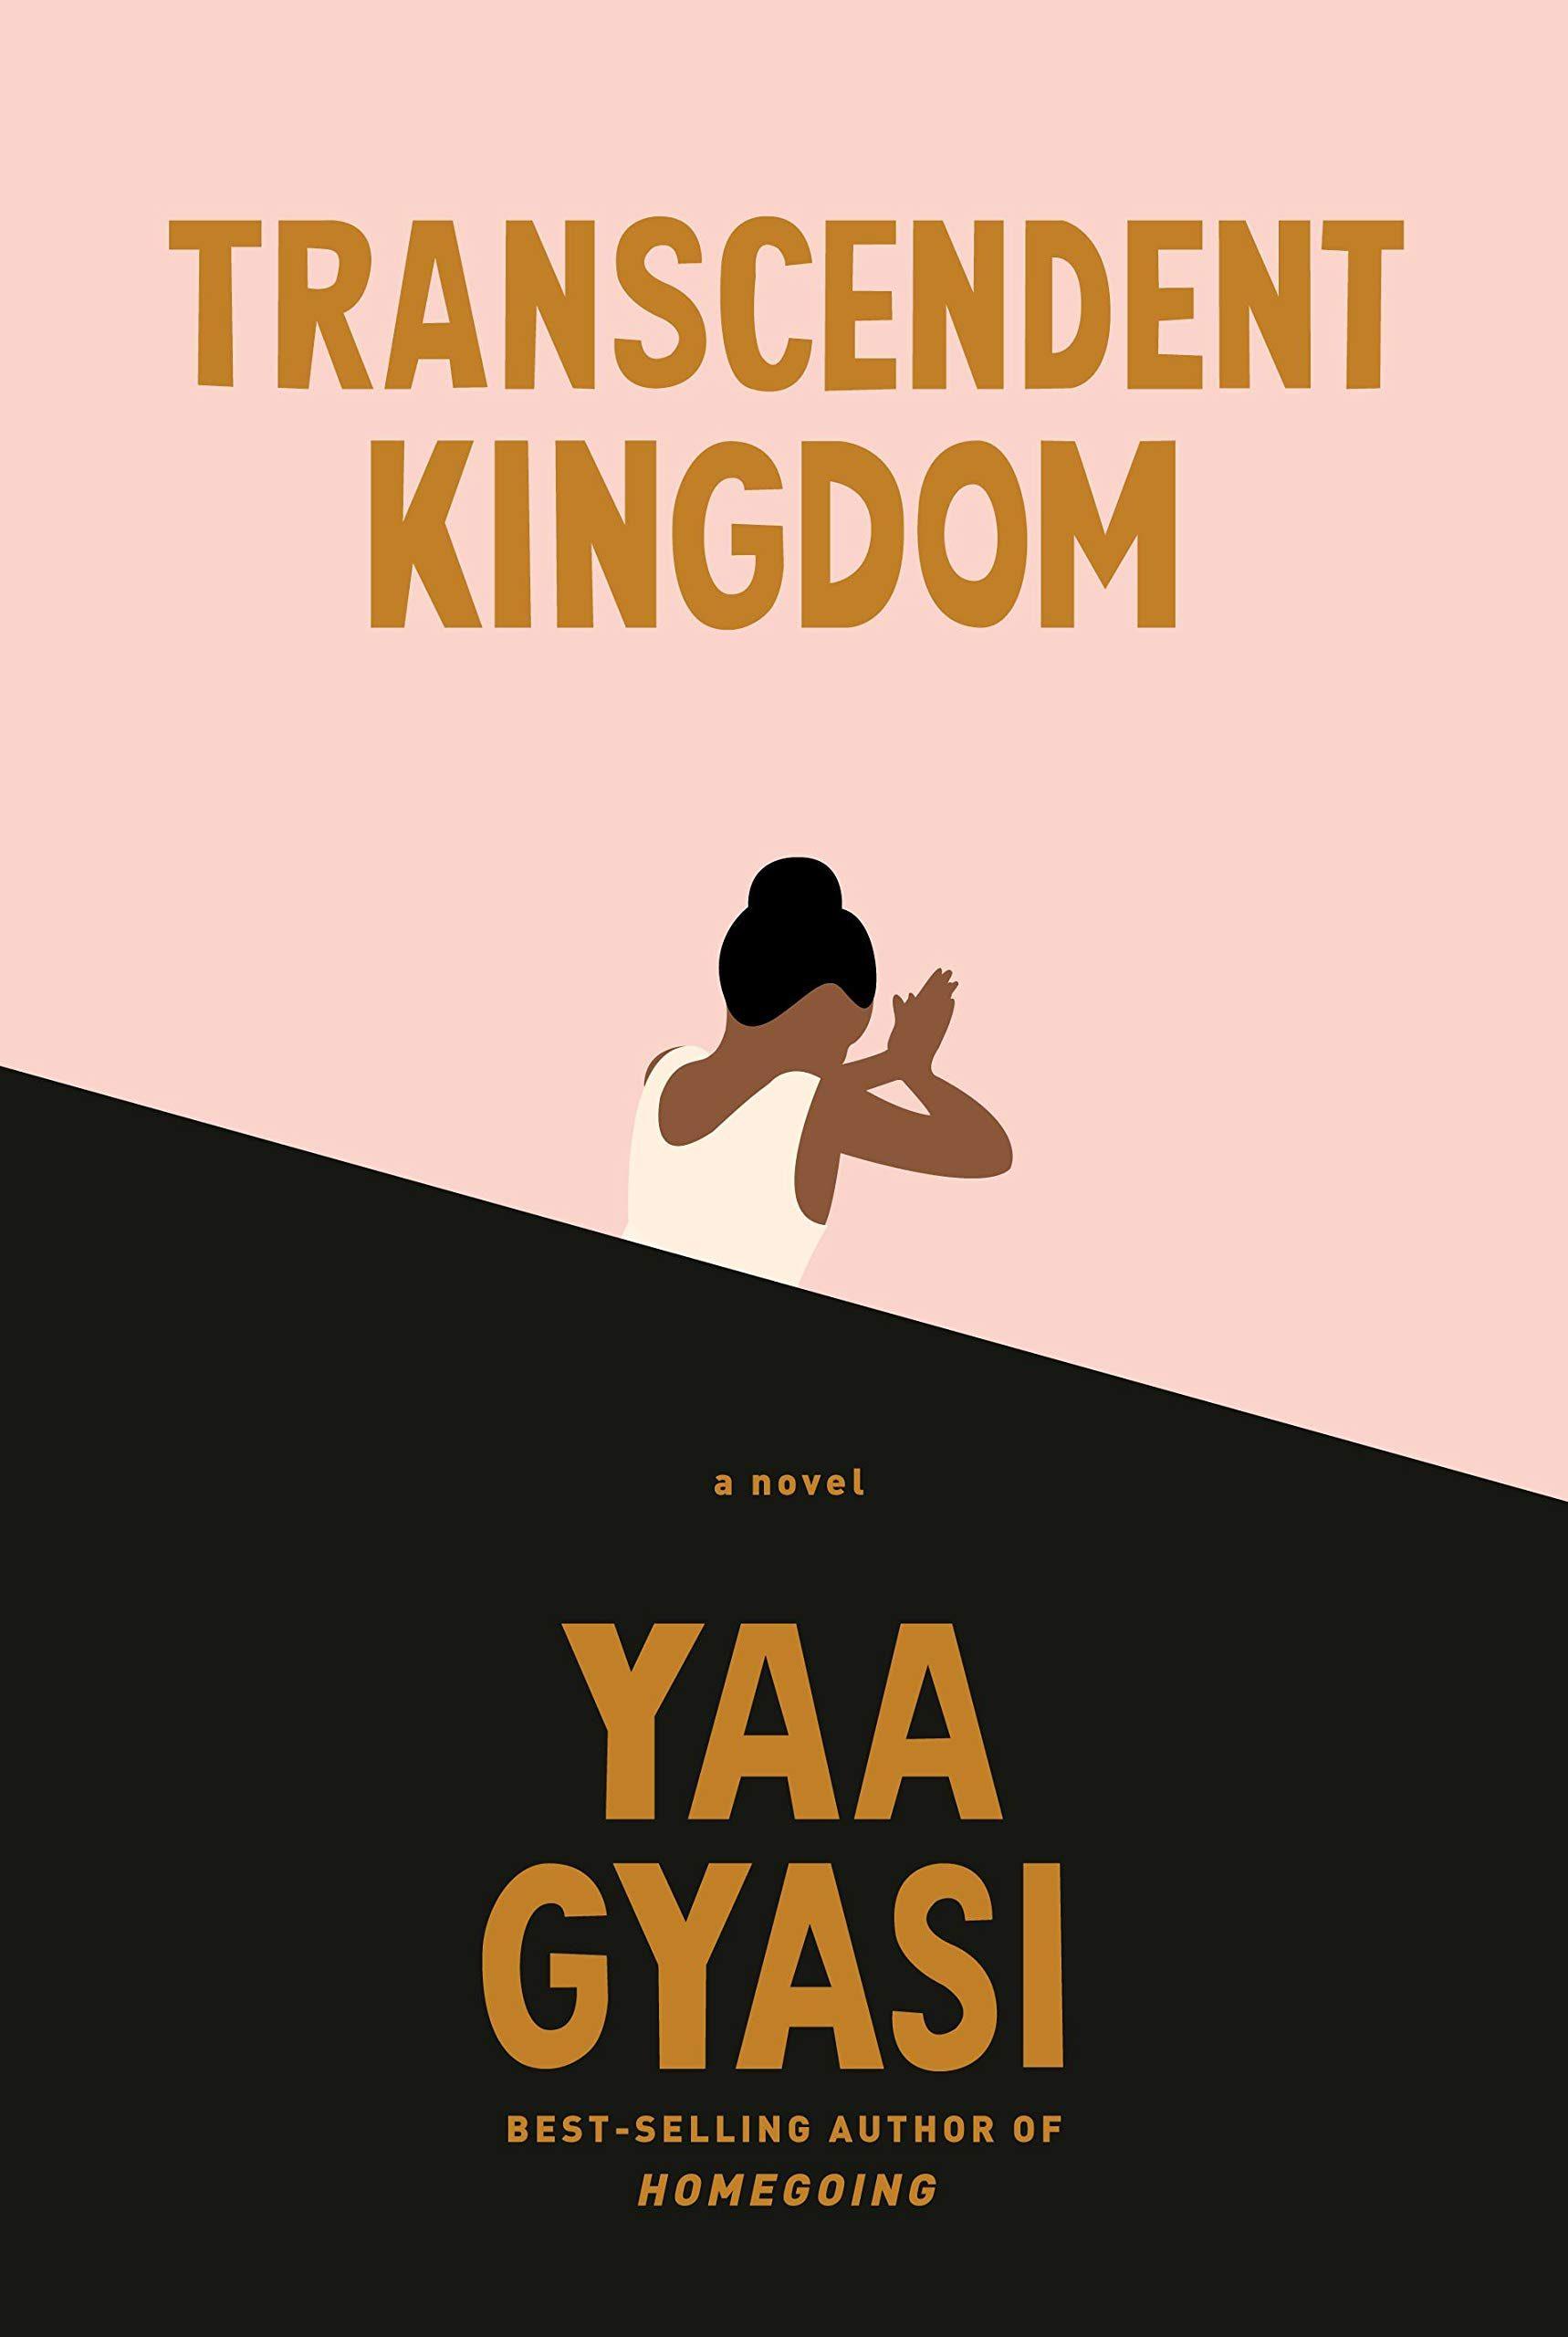 Transcendent Kingdom book